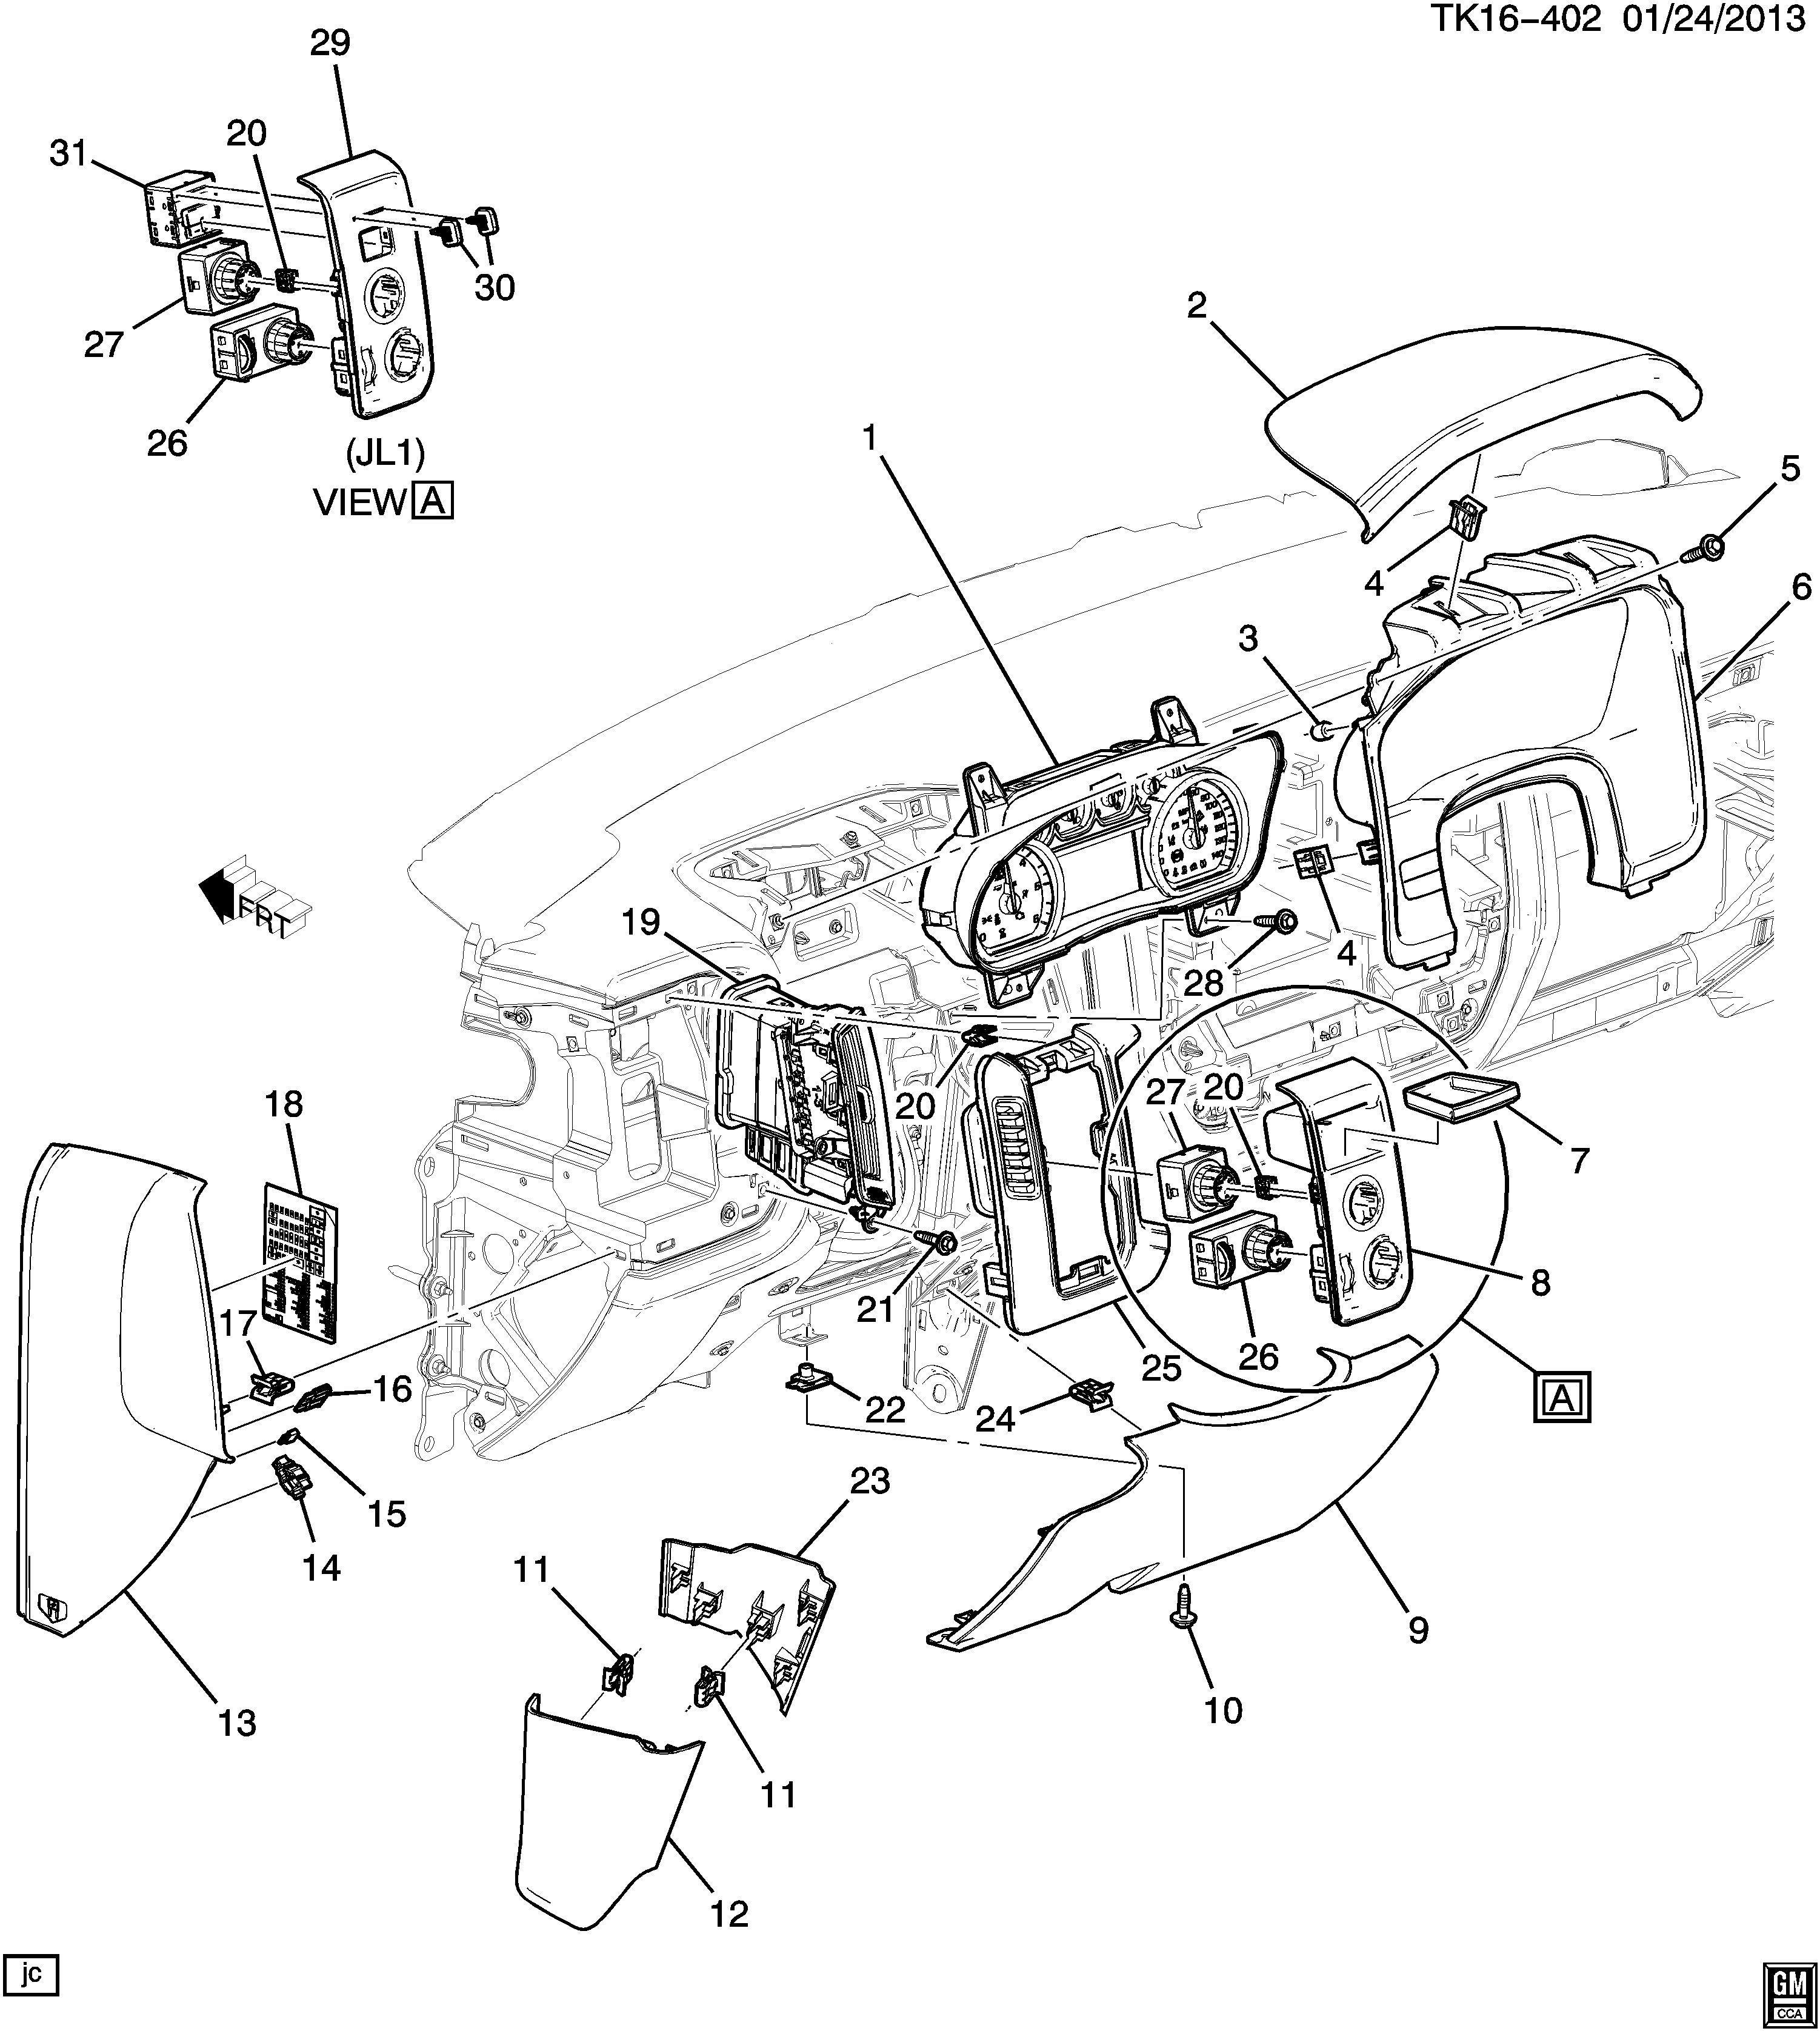 2015 Chevrolet Silverado 3500 Switch. Transfer case shift ...2015 Silverado 3500 Parts